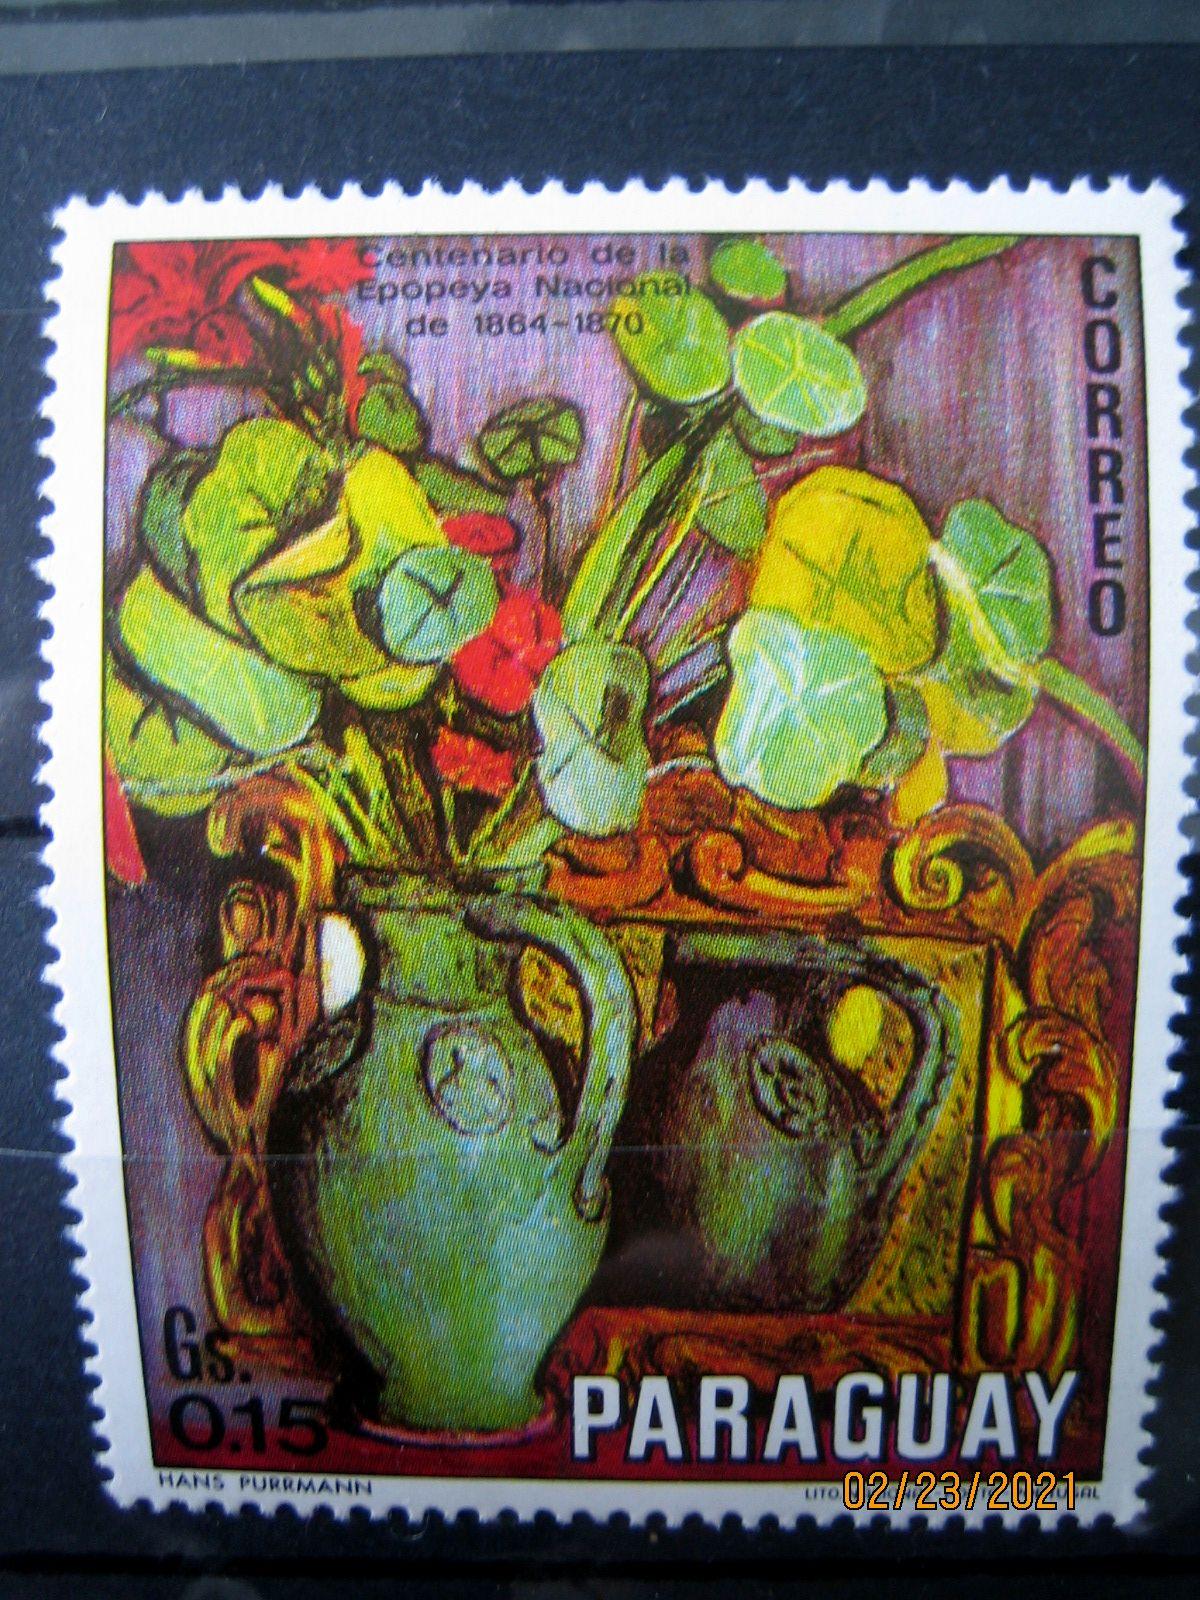 Марка Парагвай, 1970 г. Флора, 100-летие национального эпоса 1864-1870, на марке представлена Цветочная композиция Пурмана; Mi:PY 2093, Sn:PY 1299b, Yt:PY 1090, номинал — 0.15 Gs (гурани)